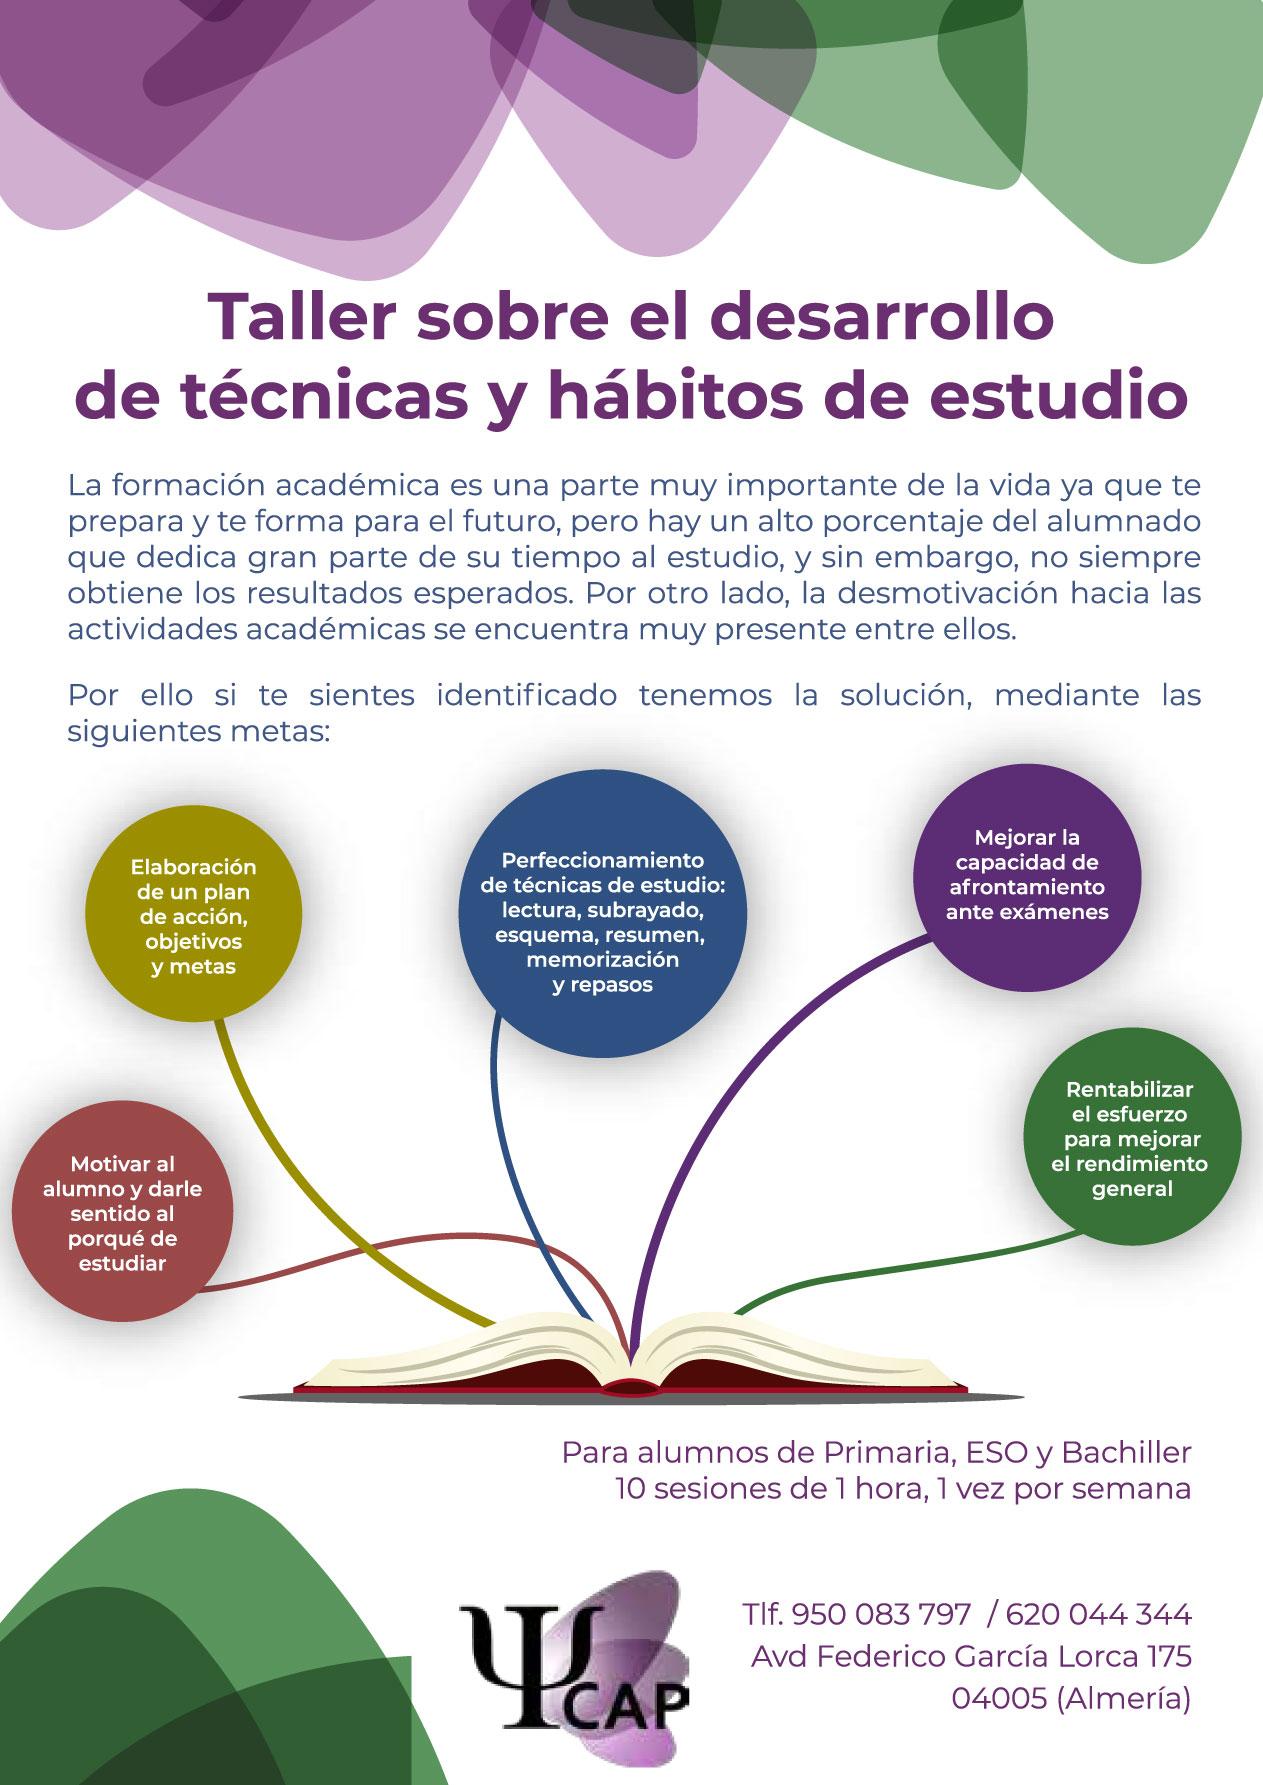 Taller hábitos de estudio en Almería